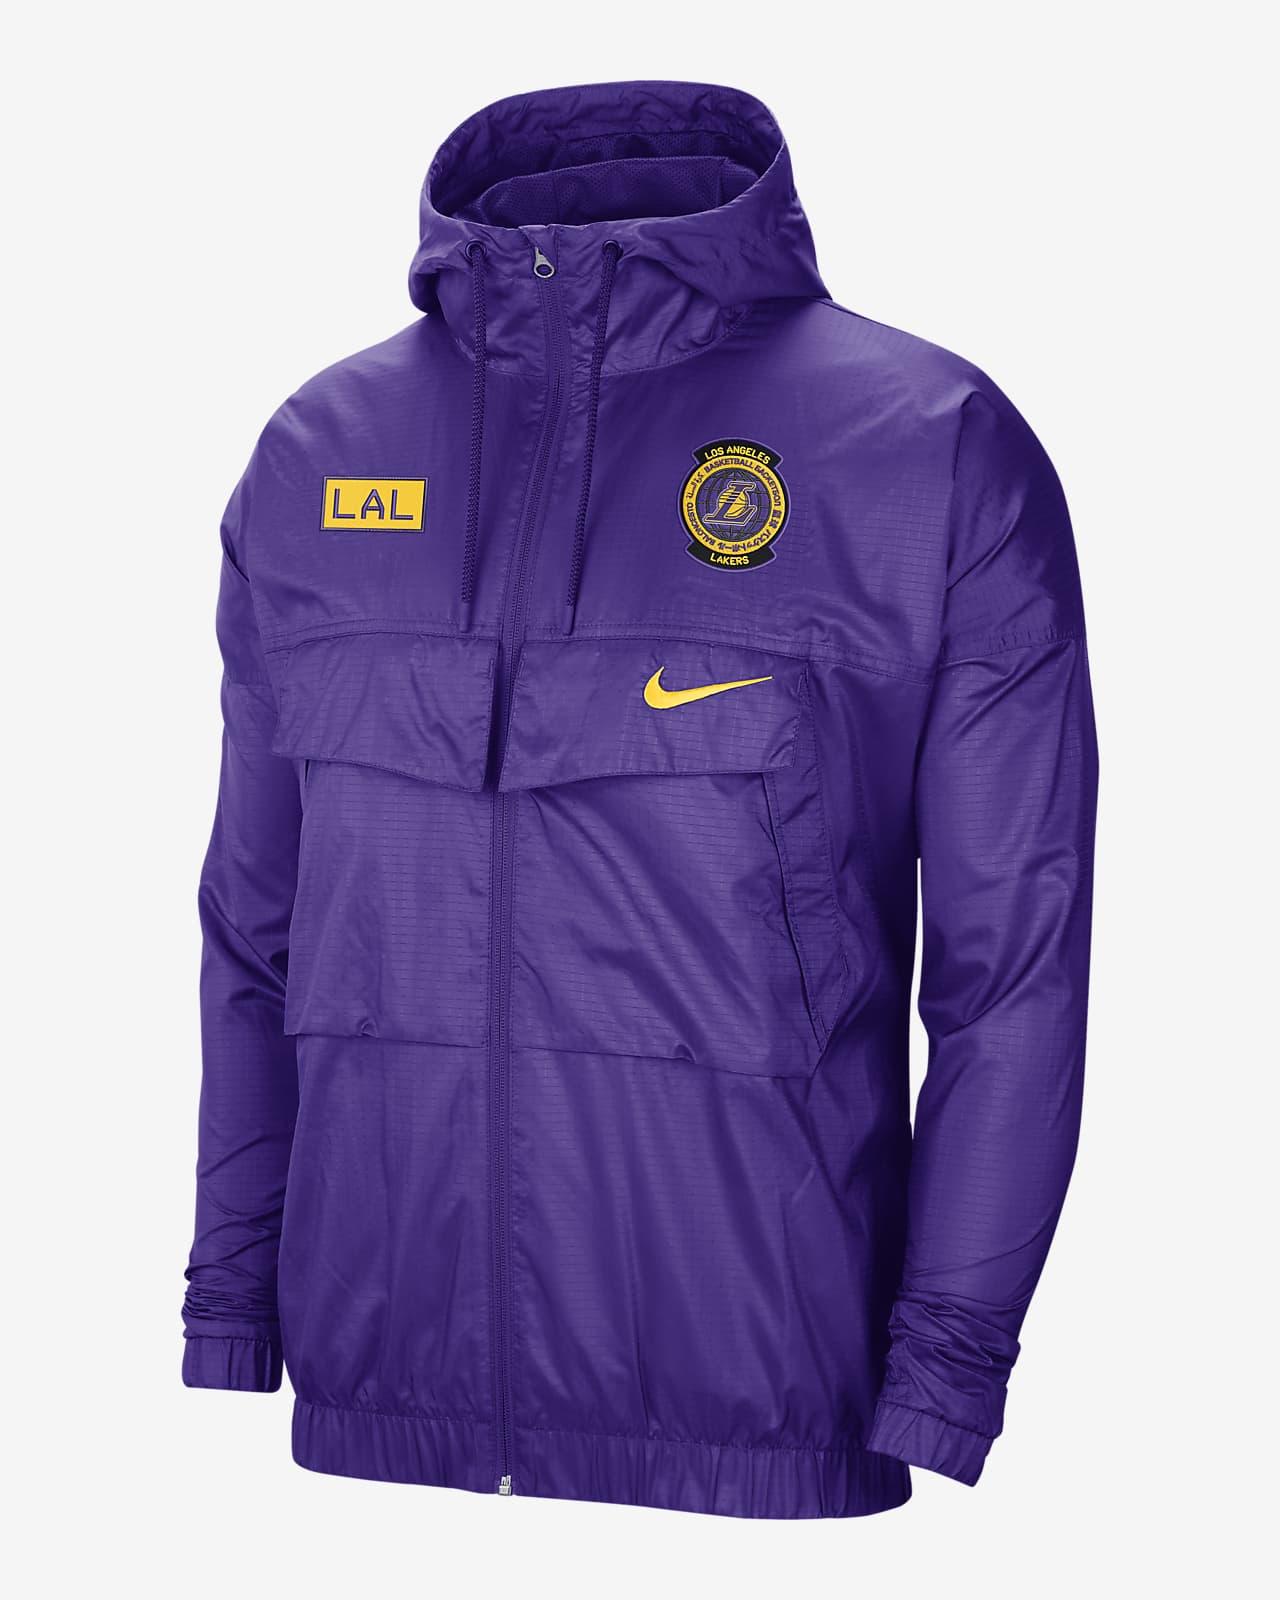 Lakers Courtside Men's Nike NBA Lightweight Jacket